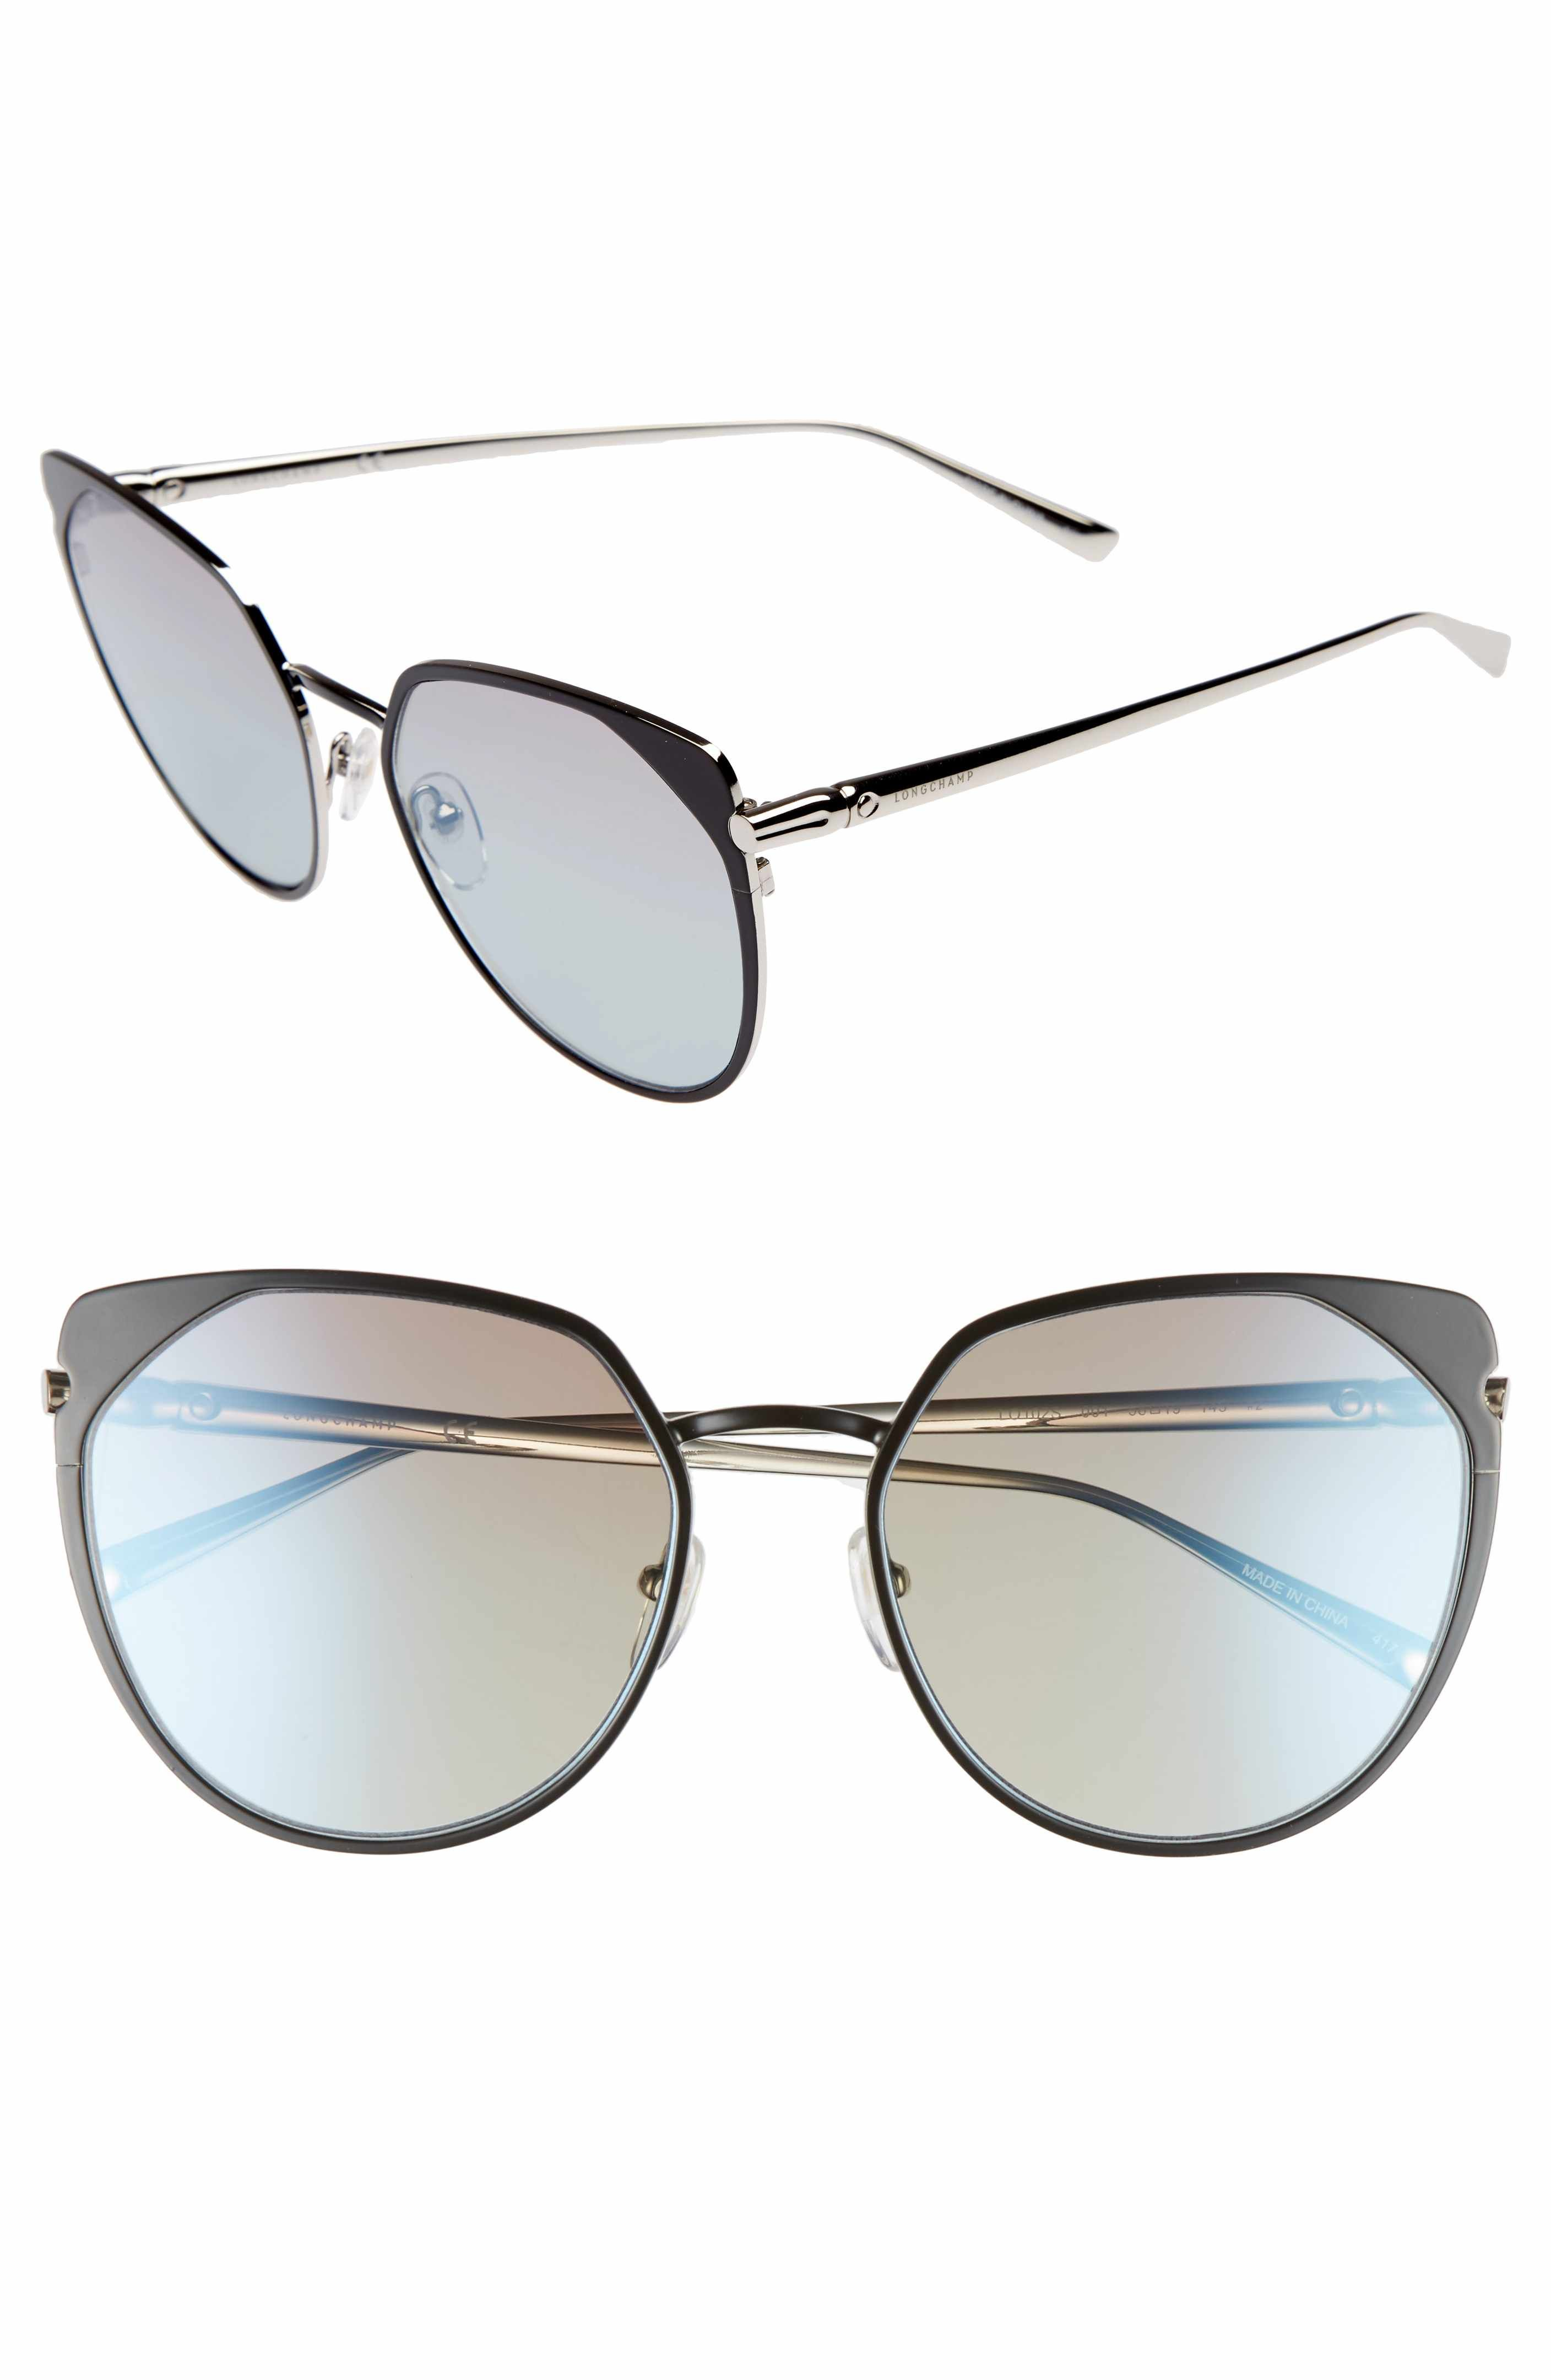 73bbdfdf425 Main Image - Longchamp 58mm Rounded Cat Eye Sunglasses Cat Eye Frames